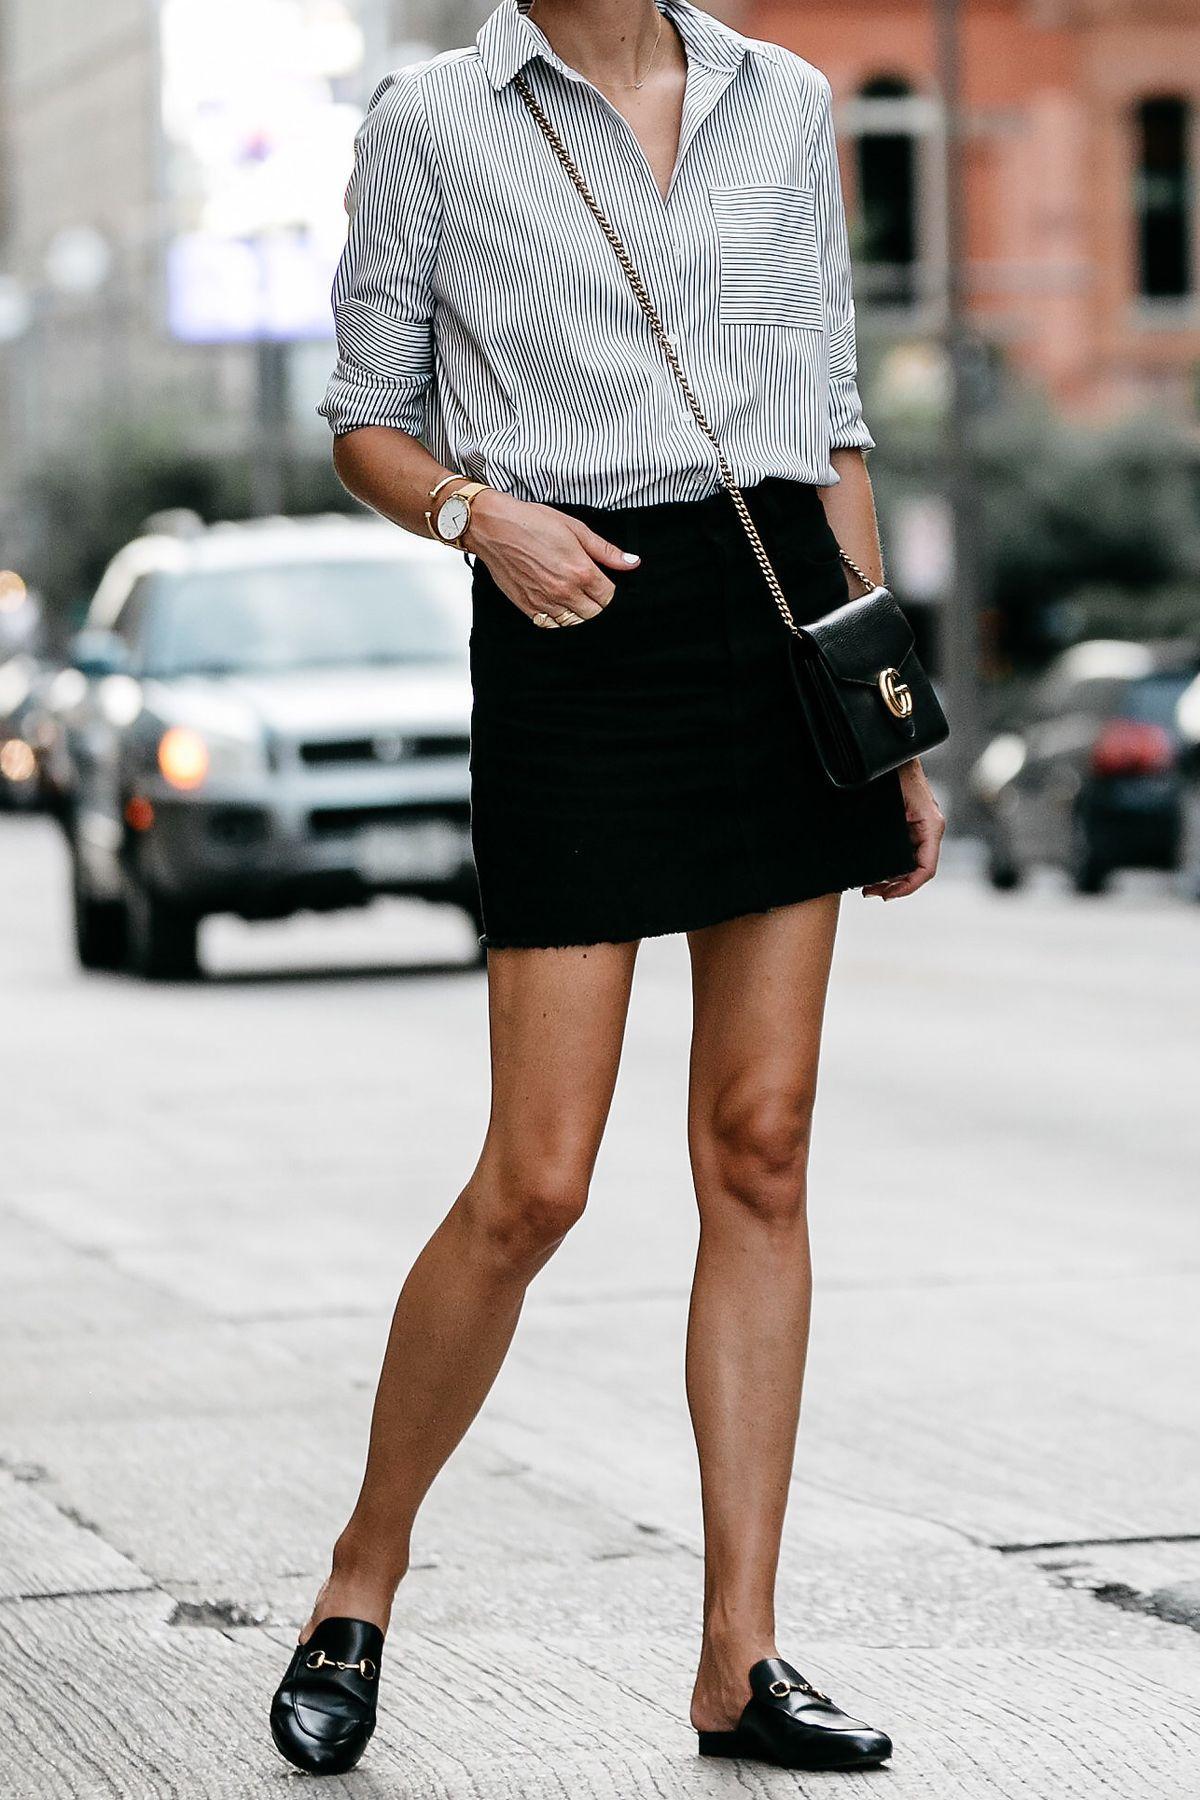 bf391e40ca6 Nordstrom Black and White Stripe Shirt Black Denim Skirt Outfit Gucci Mules  Gucci Marmont Handbag Fashion Jackson Dallas Blogger Fashion Blogger Street  ...